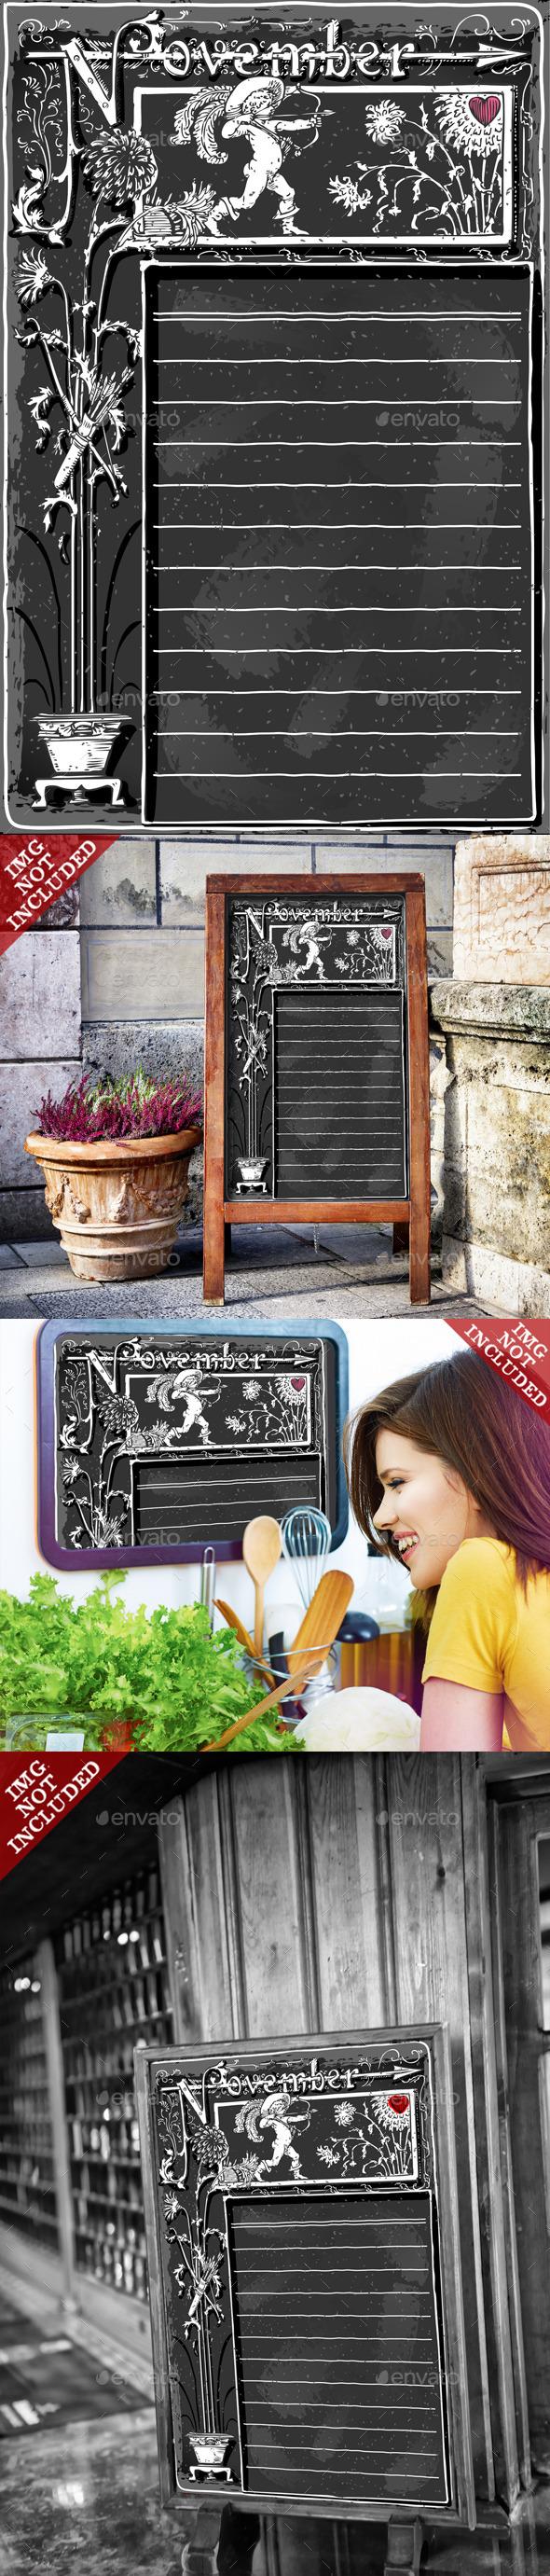 Vintage November Page with Cupid on Blackboard - Backgrounds Decorative